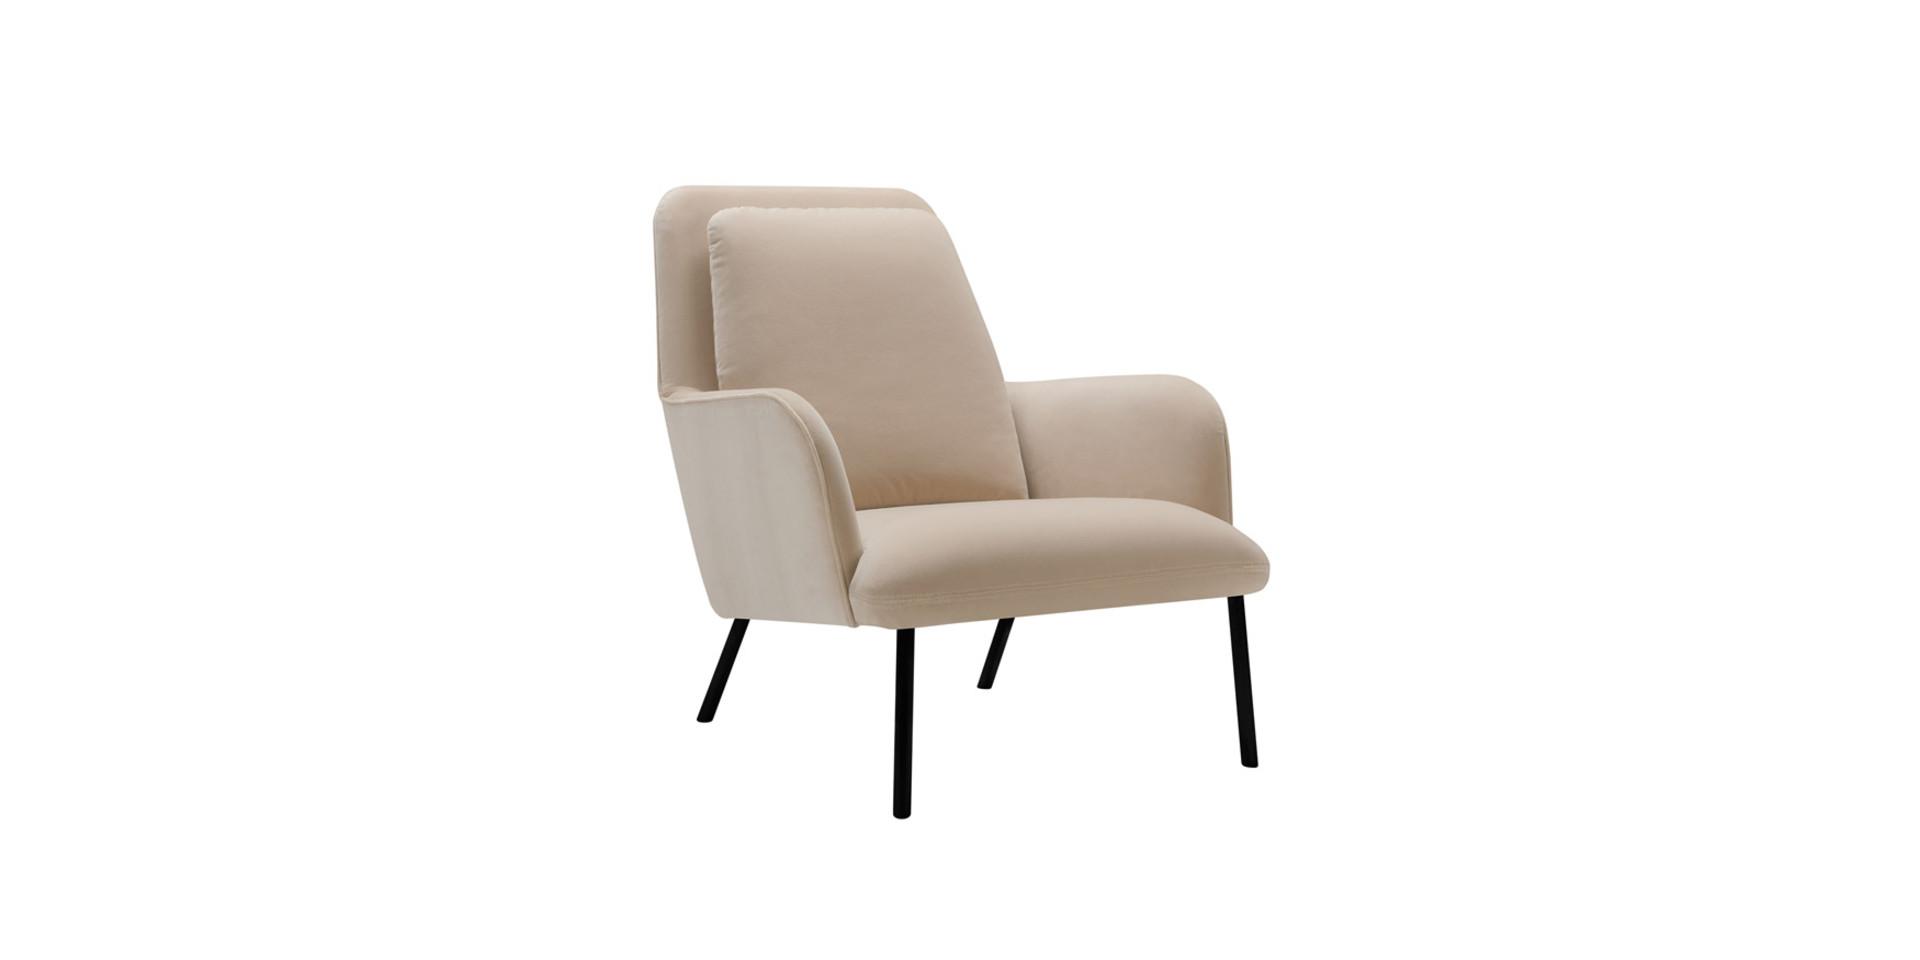 OLIVER_armchair_lario03_beige_2